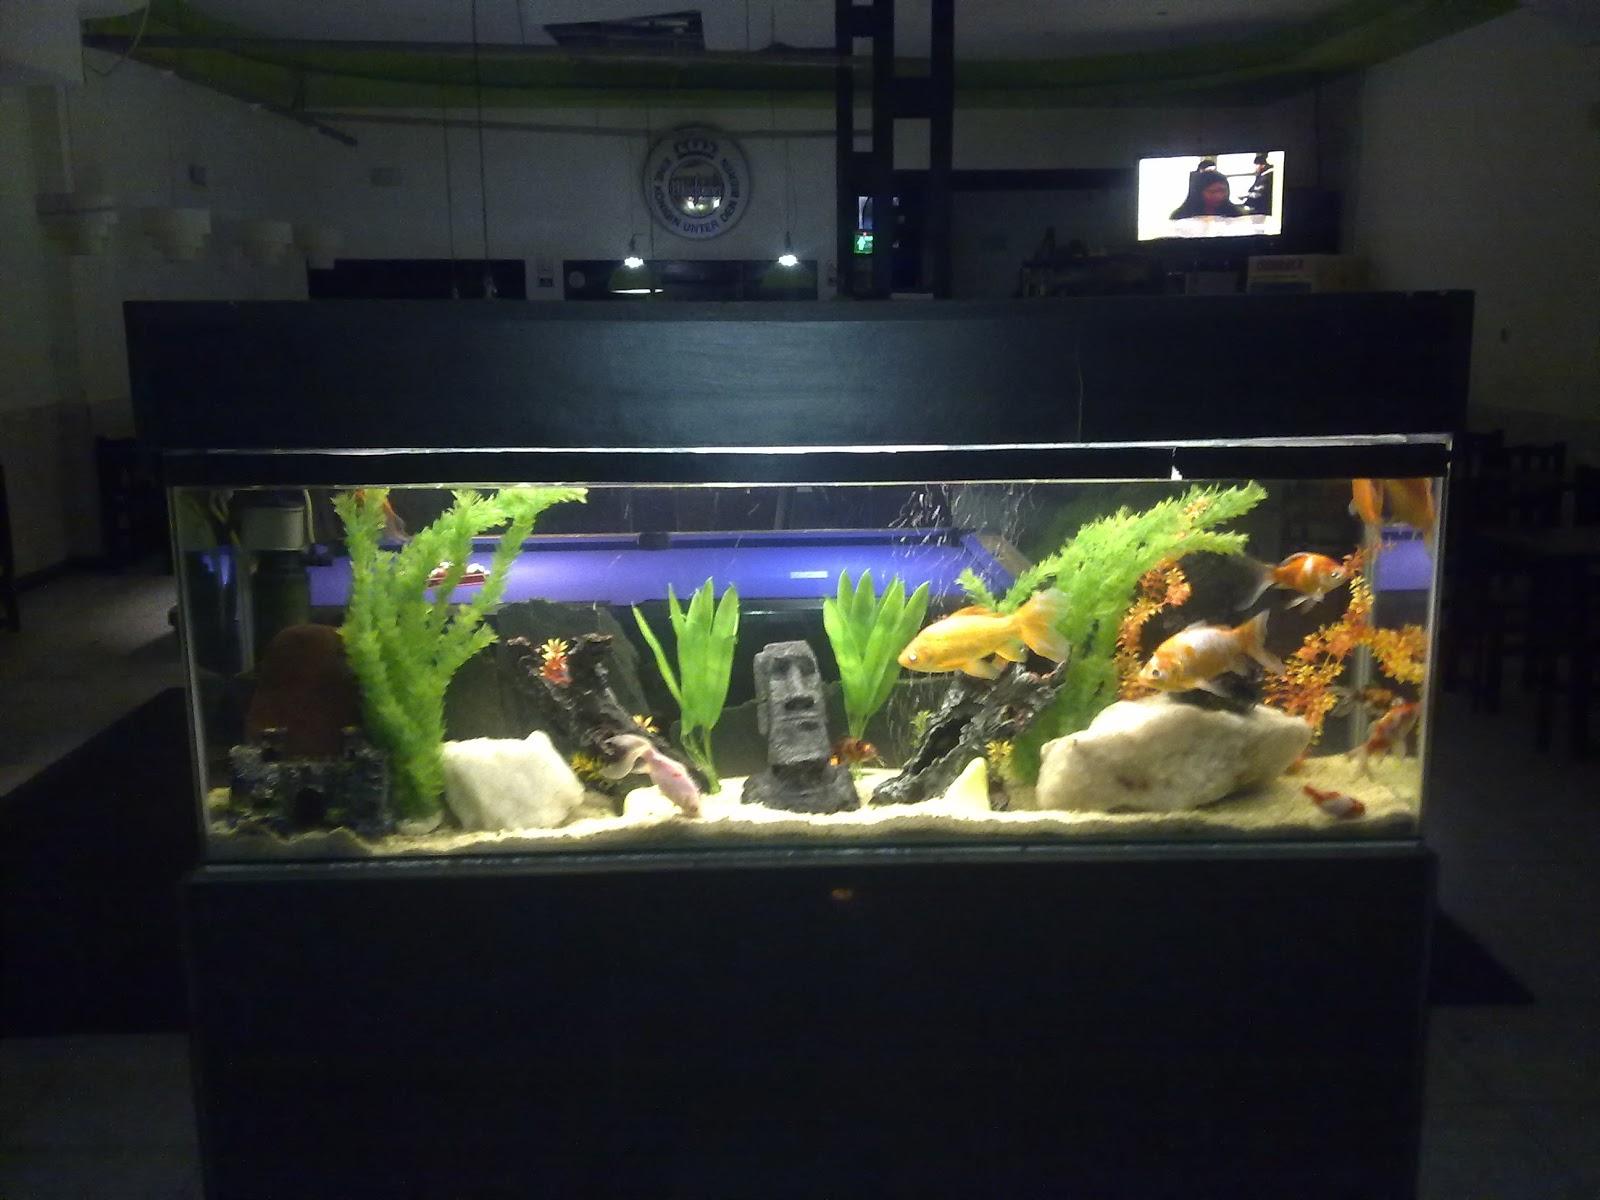 Acuarios decorpez pecera decoratva charly - Decoracion para acuarios ...